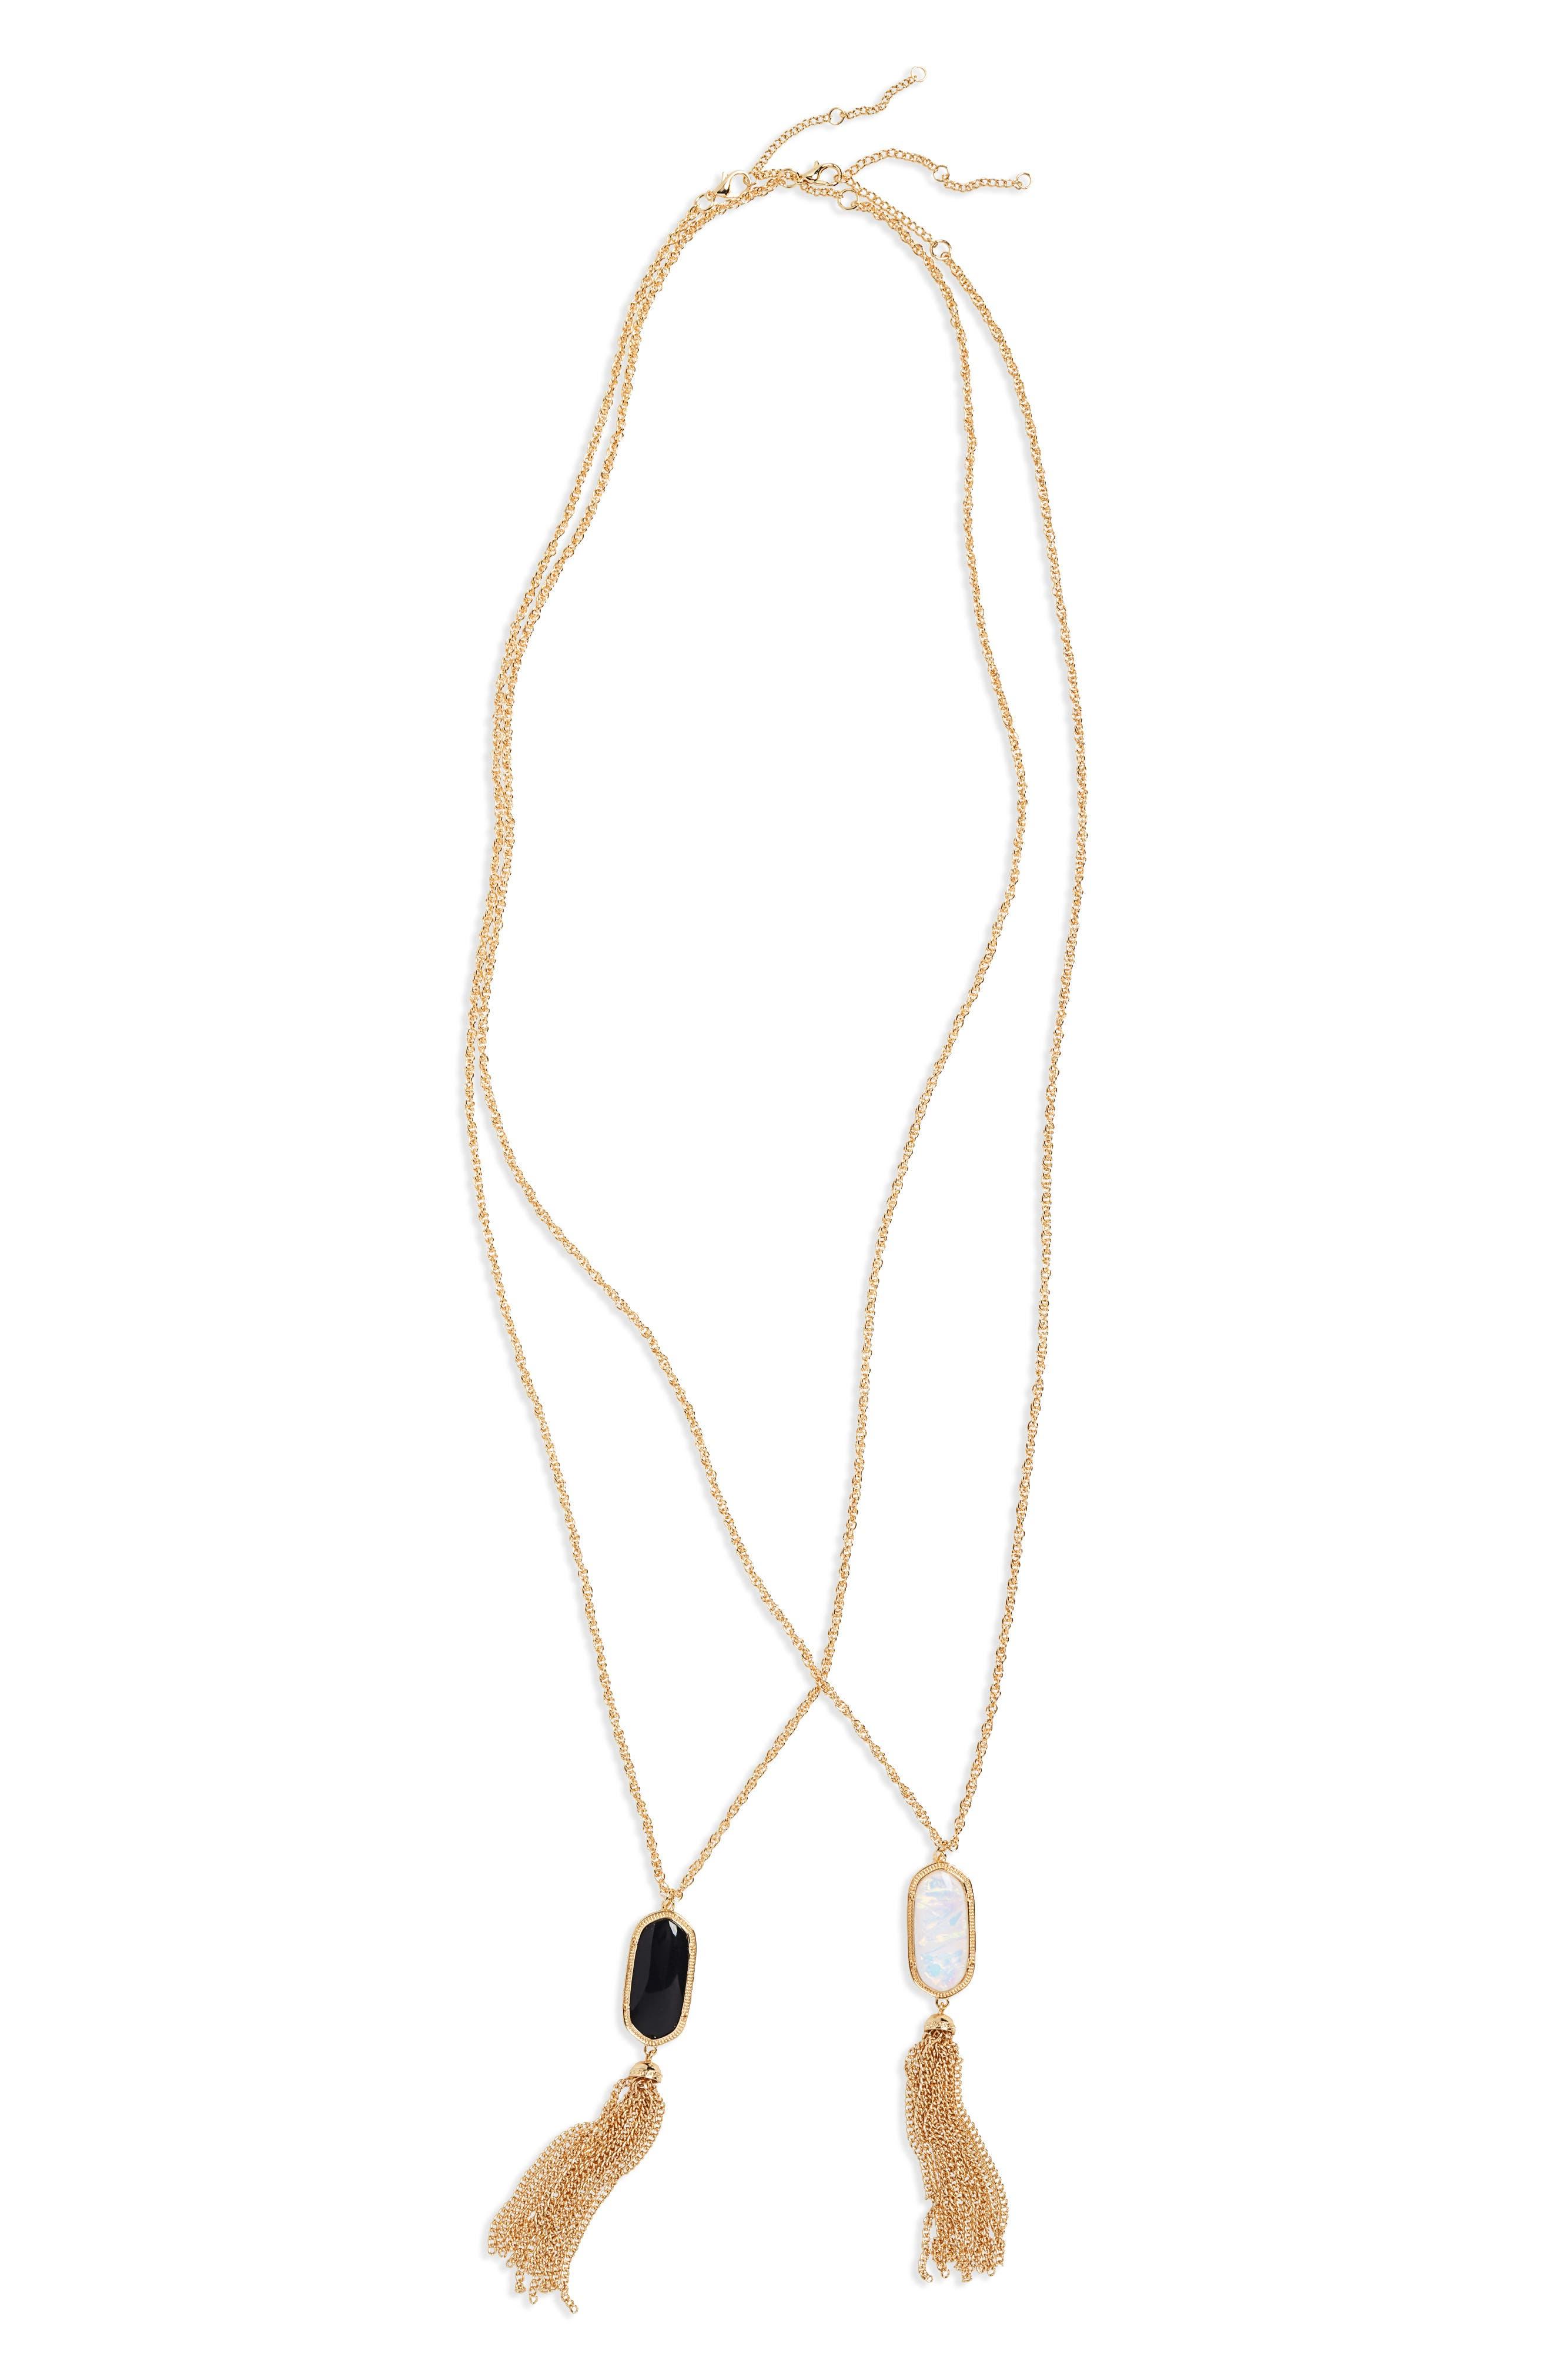 2-Pack Stone Tassel Pendant Necklaces,                             Main thumbnail 1, color,                             710